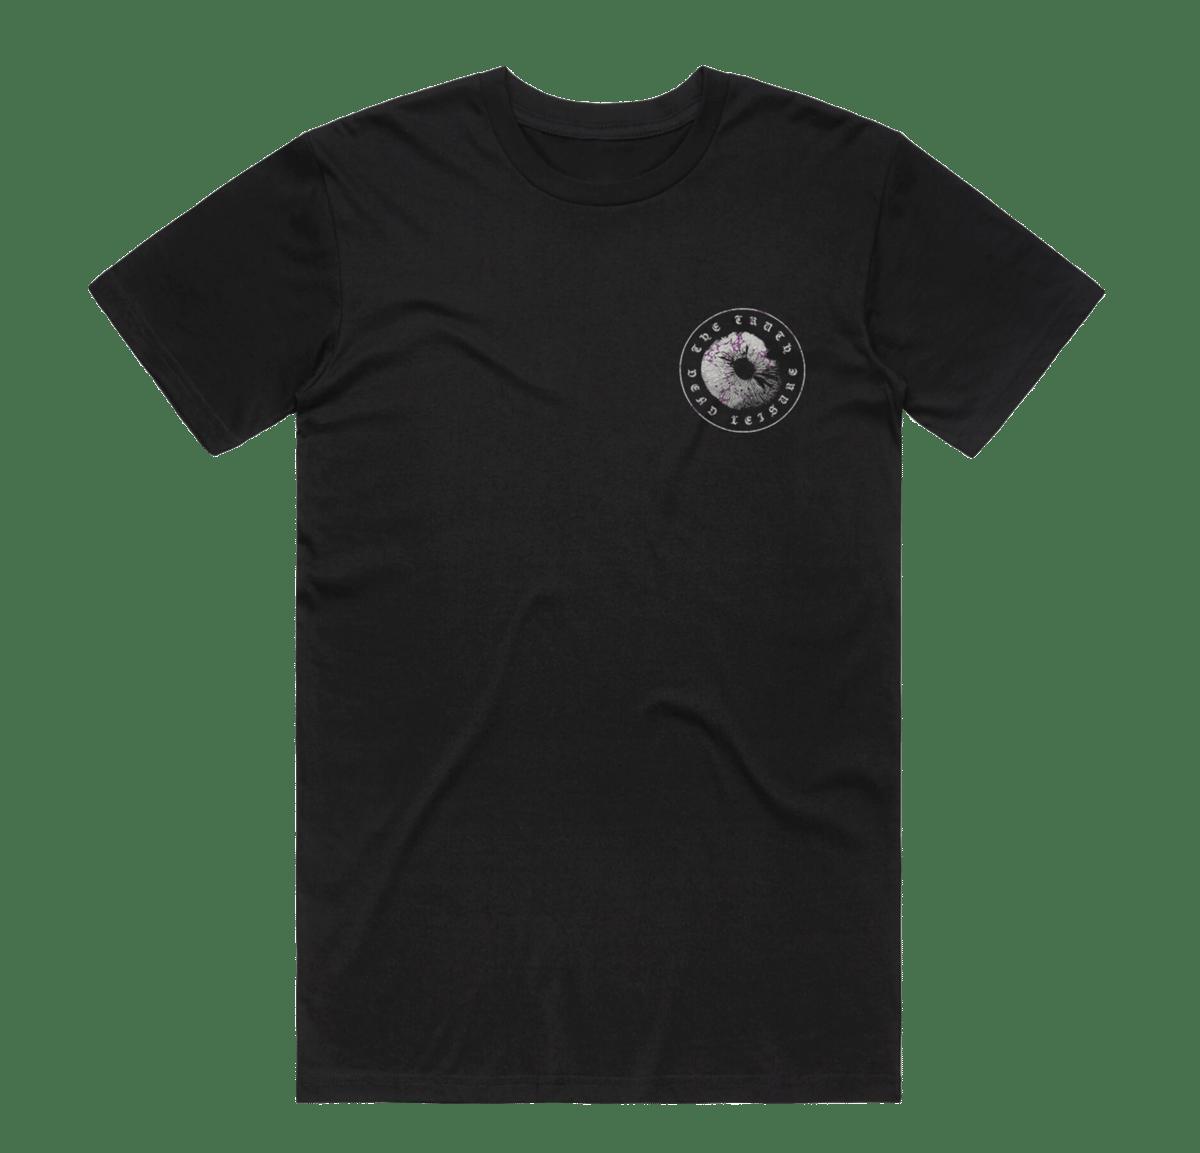 Spore T-shirt - Black